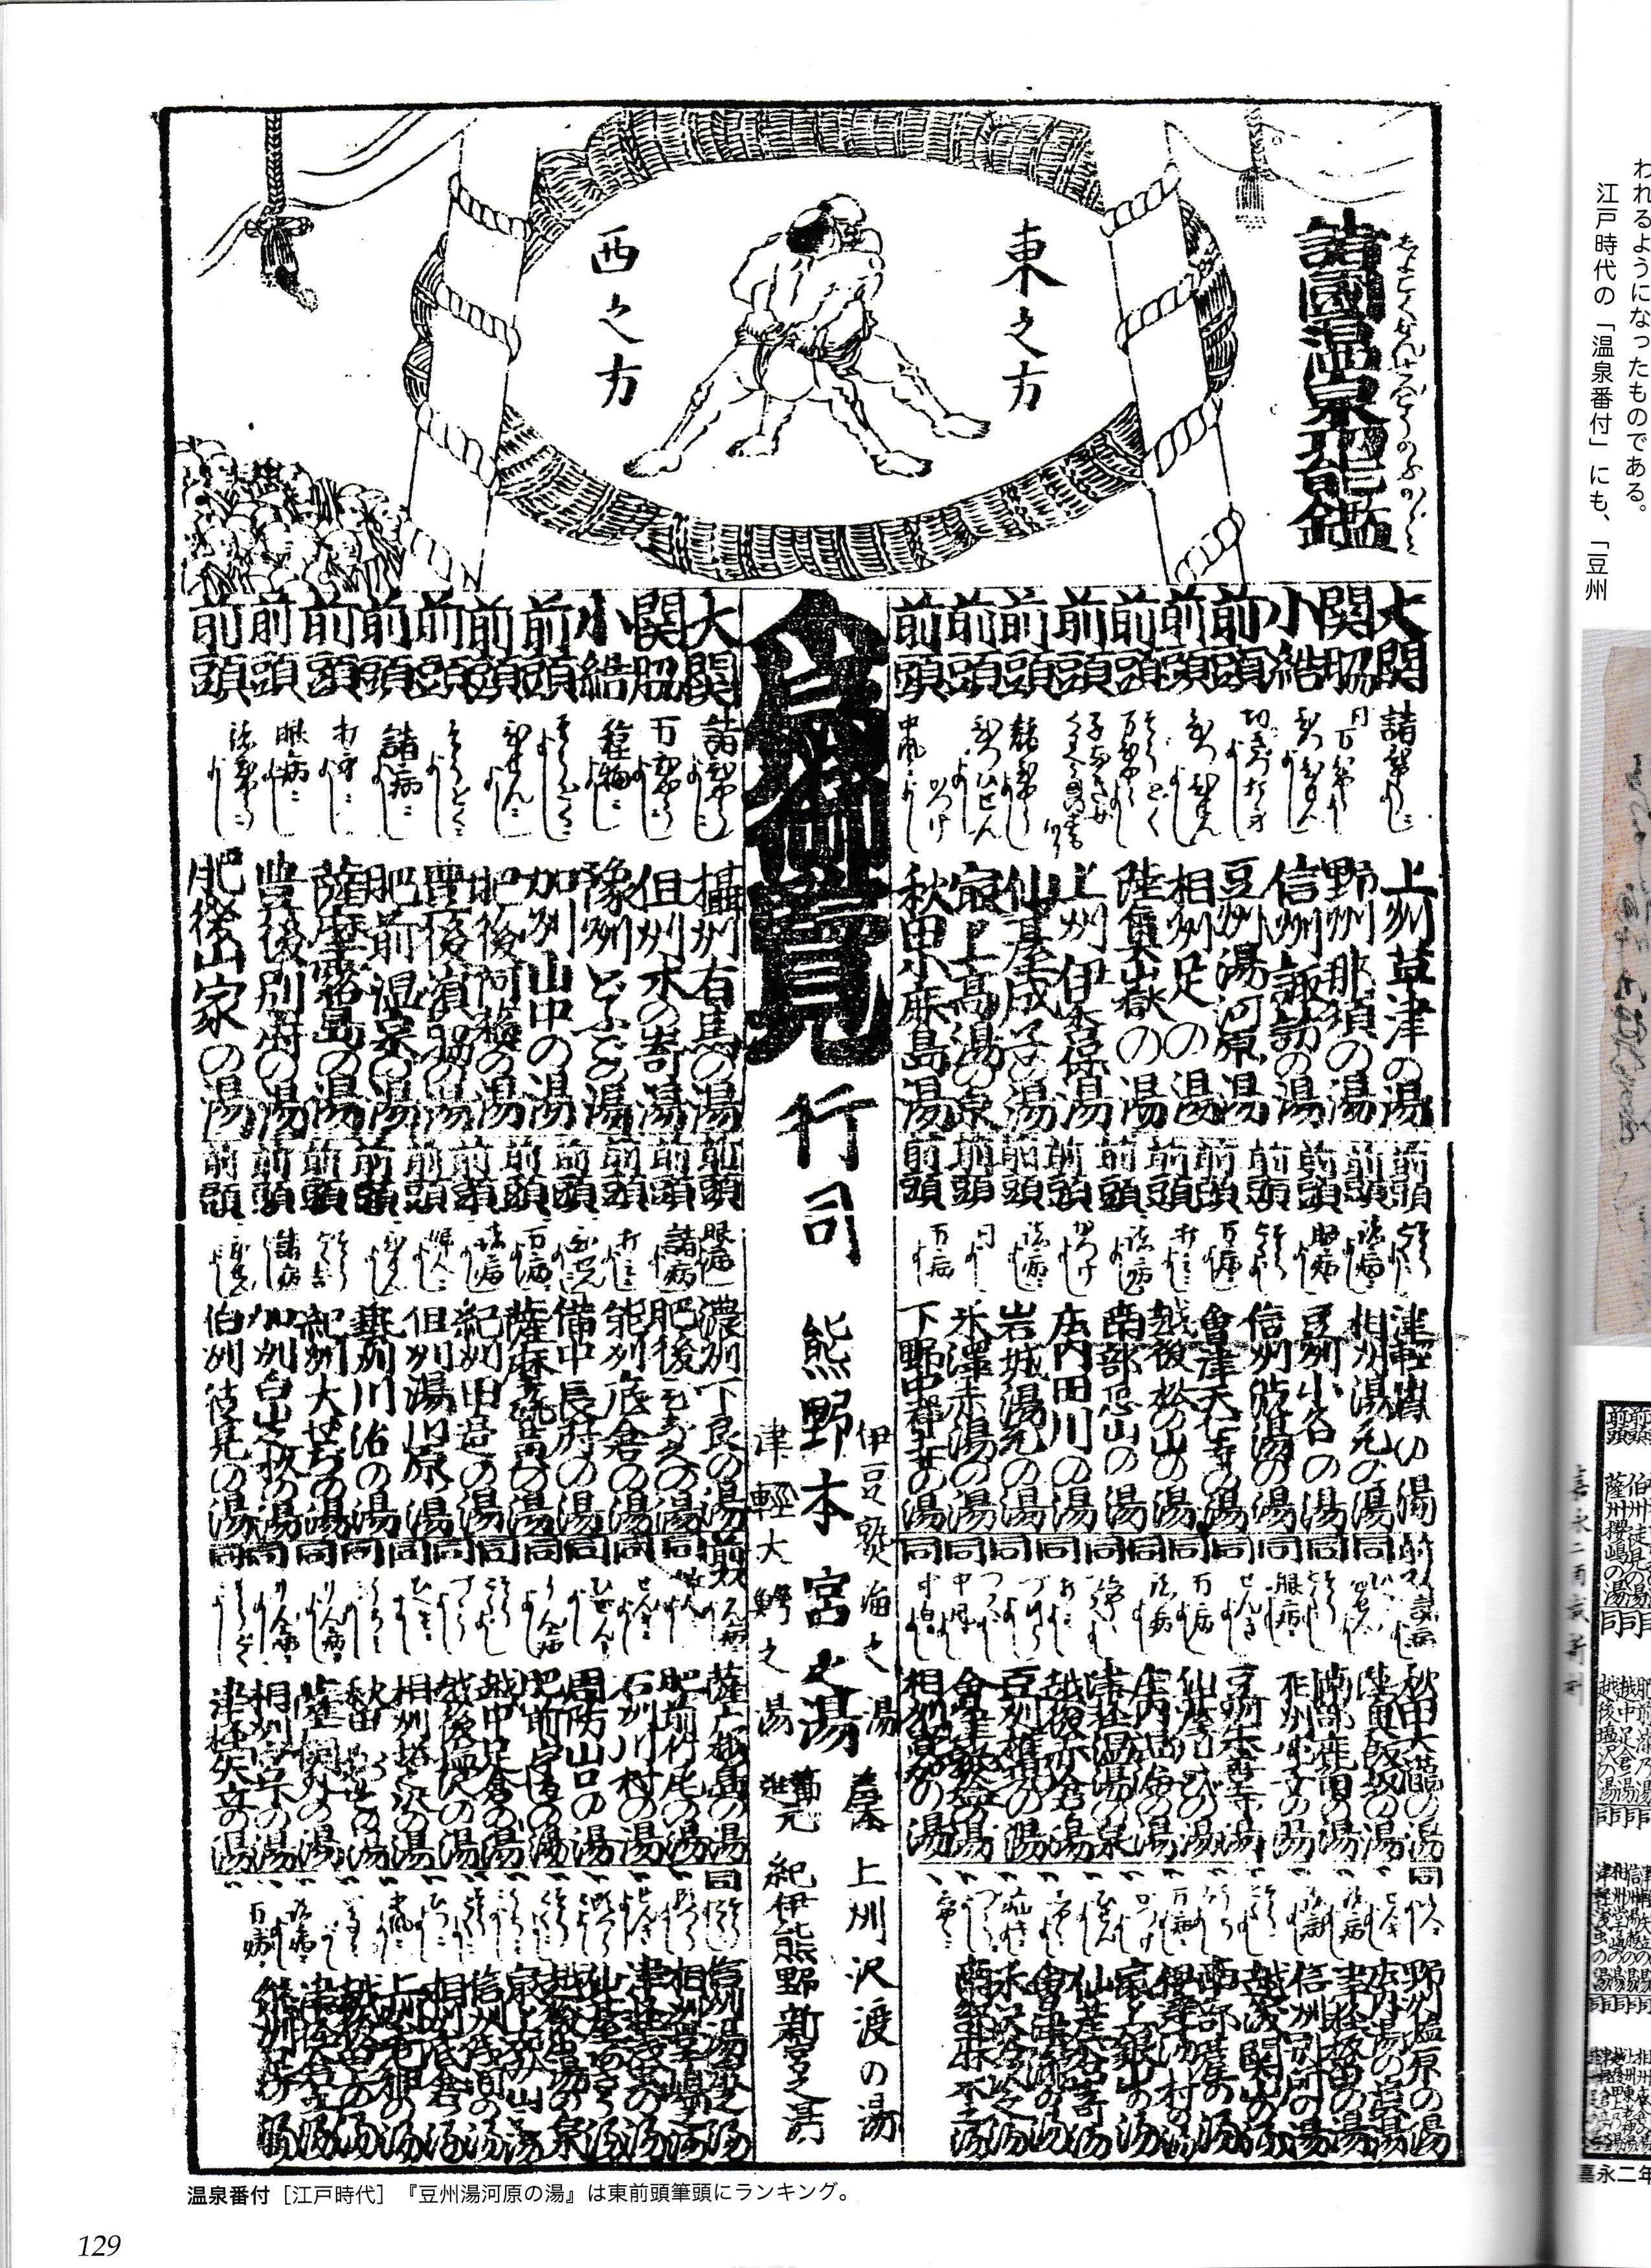 futari-komorebiのブログ温泉番付